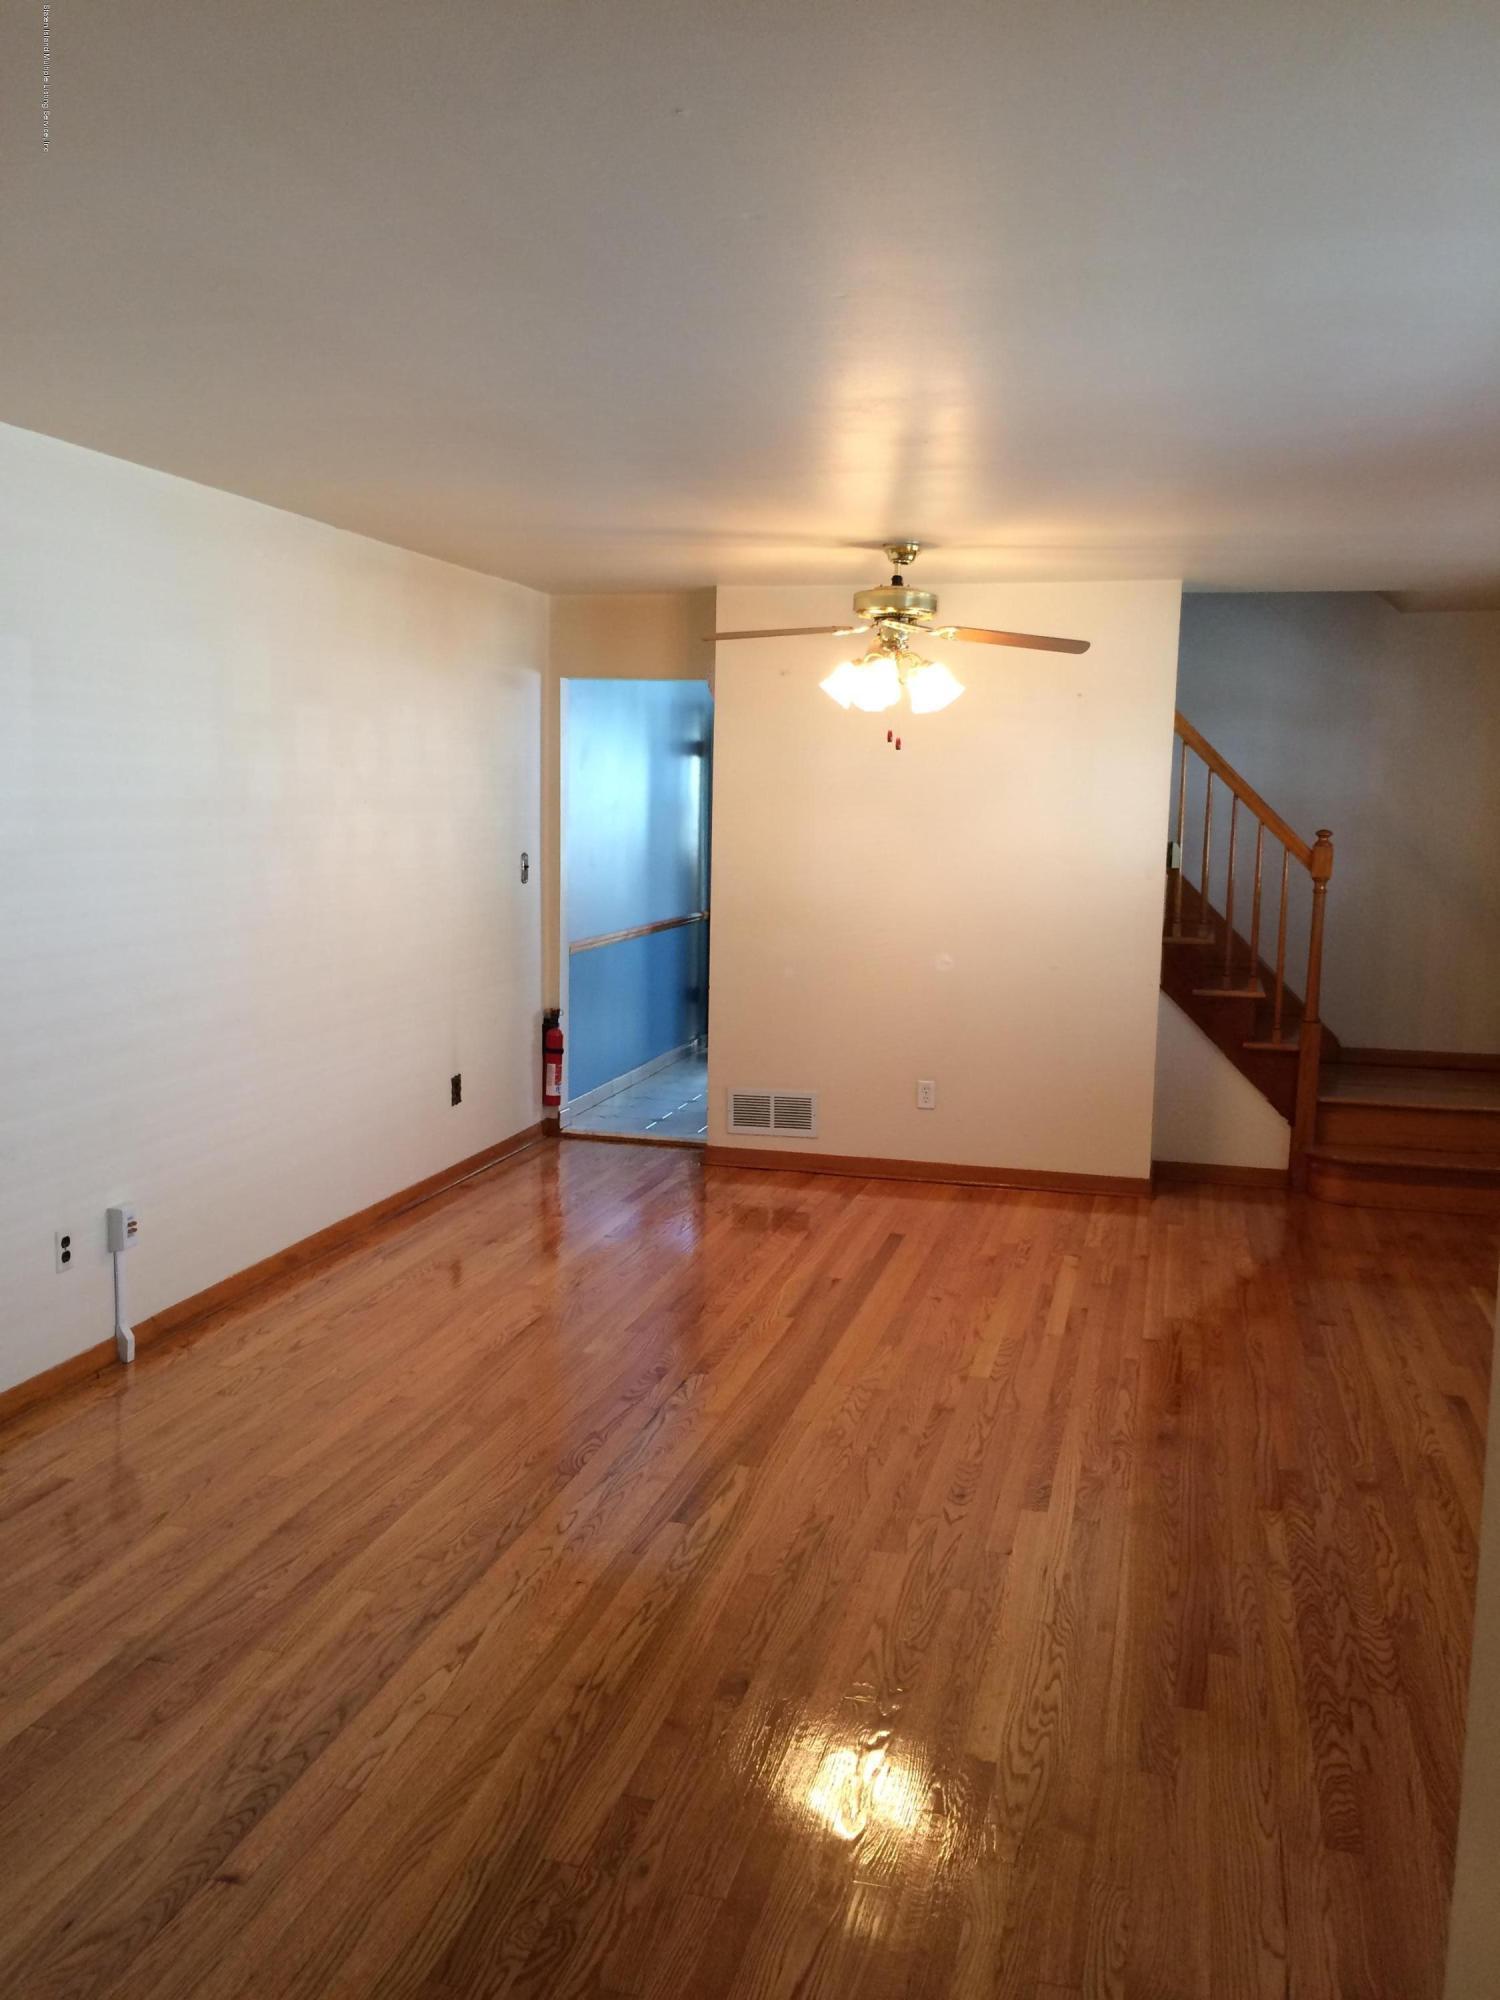 Single Family - Semi-Attached 30 Bent Street  Staten Island, NY 10312, MLS-1130498-2